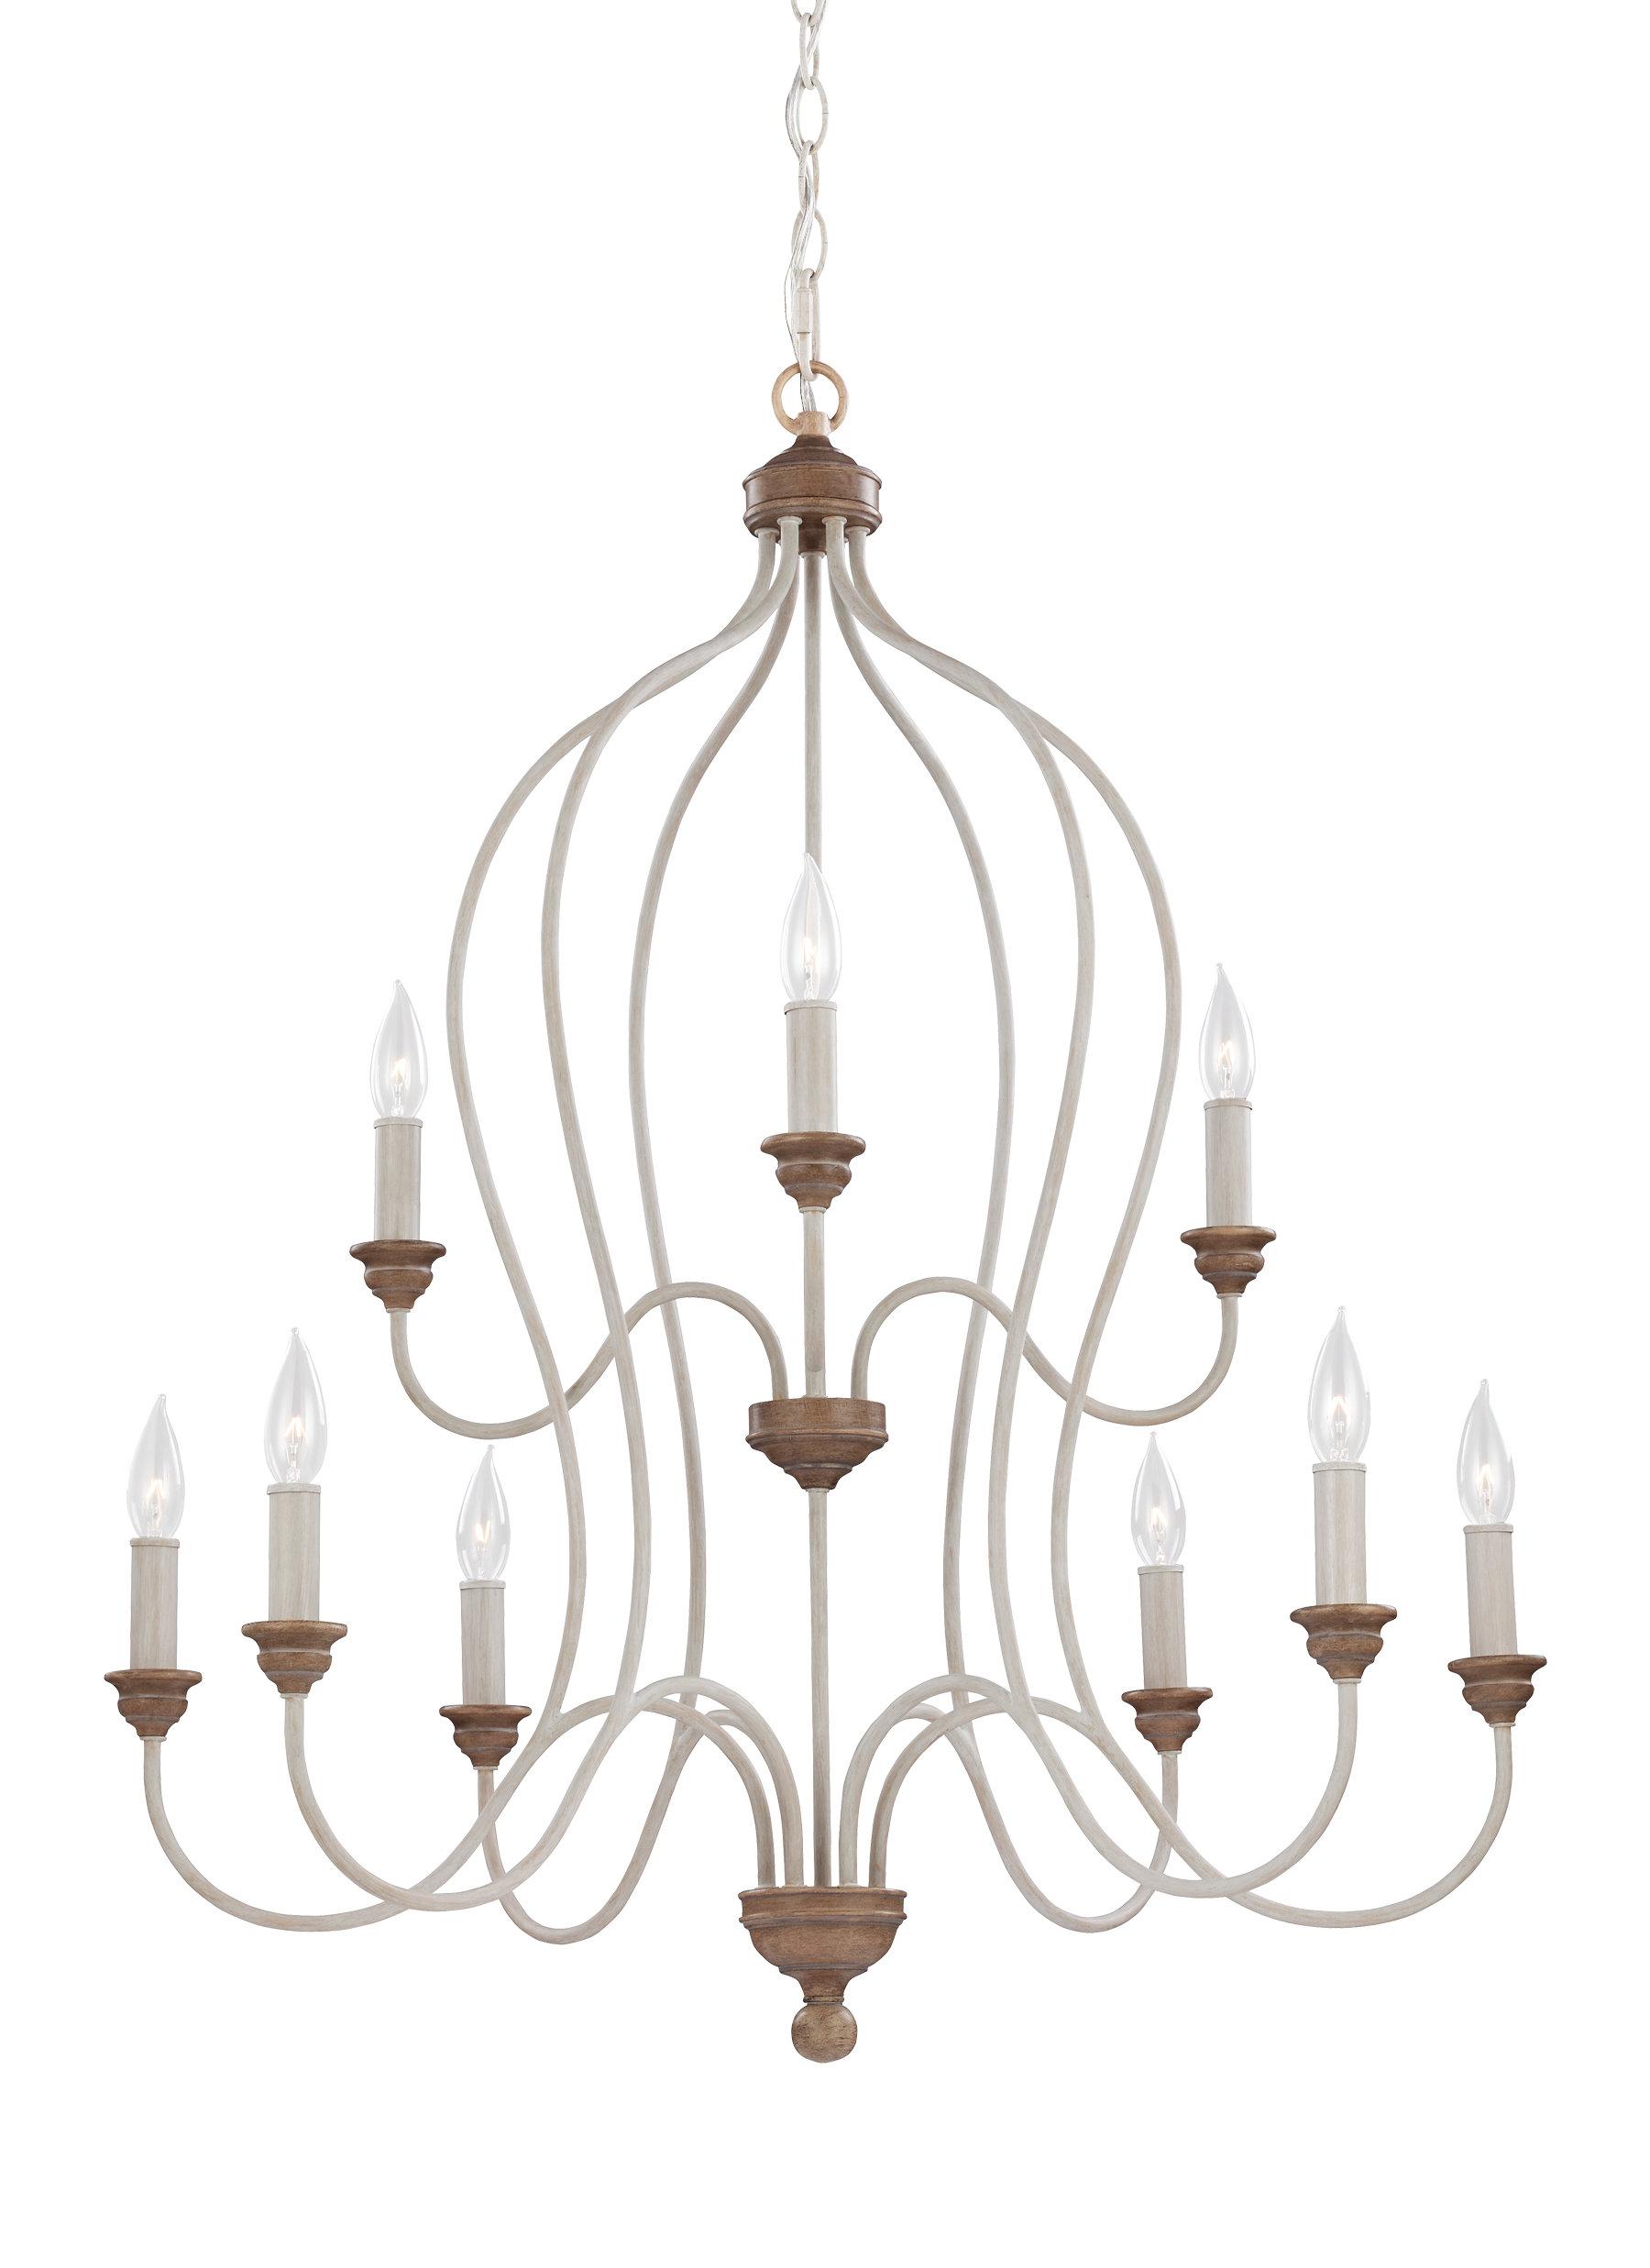 Sundberg 9-Light Candle Style Chandelier pertaining to Watford 9-Light Candle Style Chandeliers (Image 20 of 30)